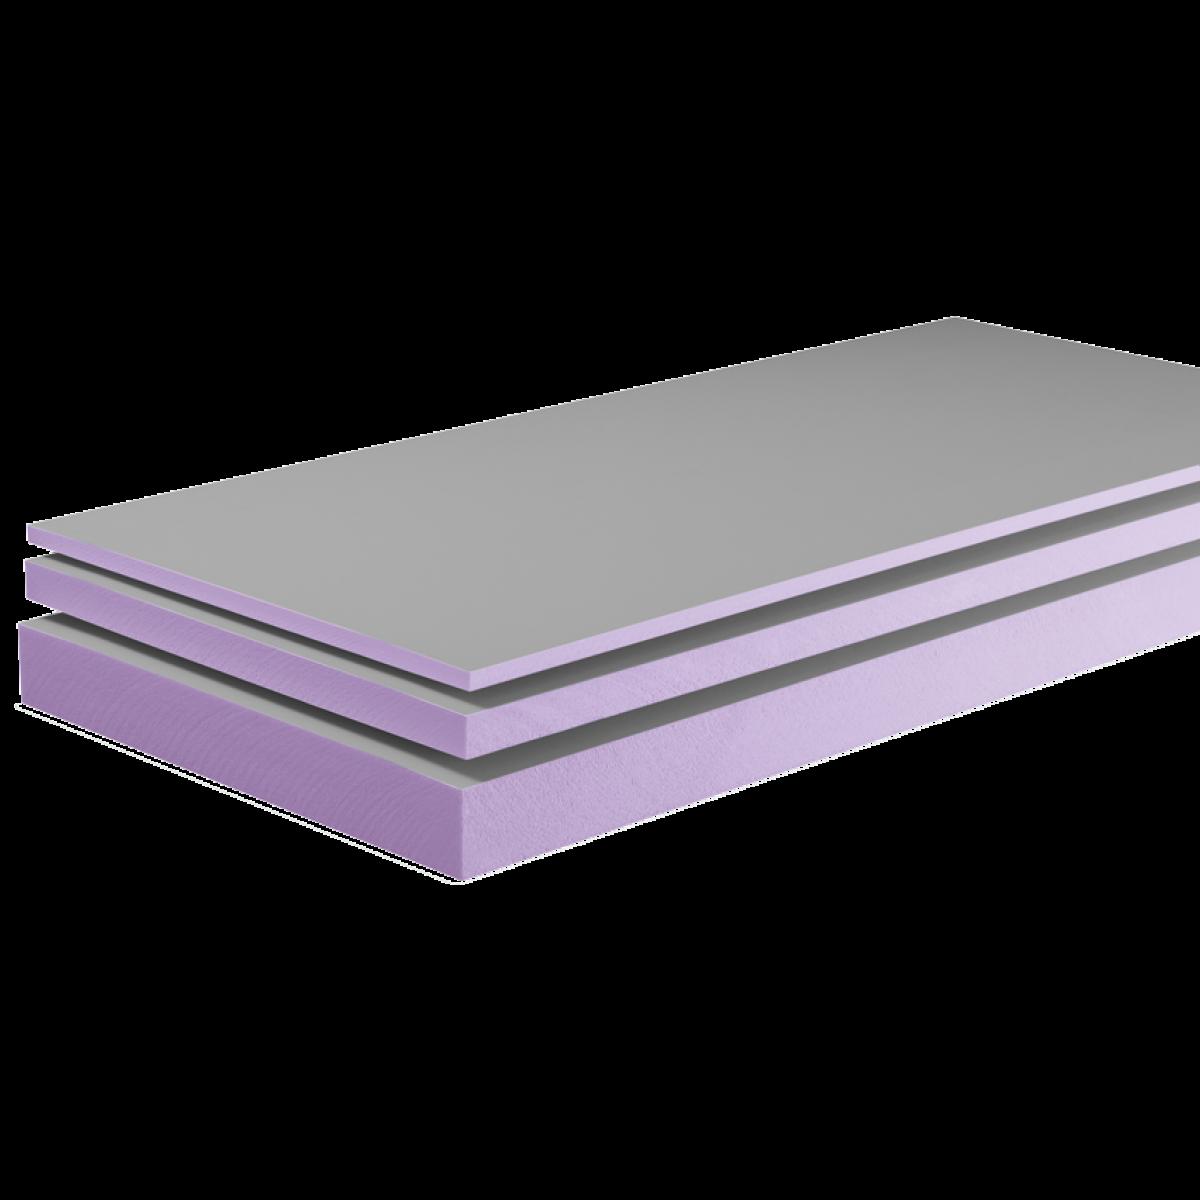 Systembauplatten 2600 x 600 x 20 mm / HBCD-frei